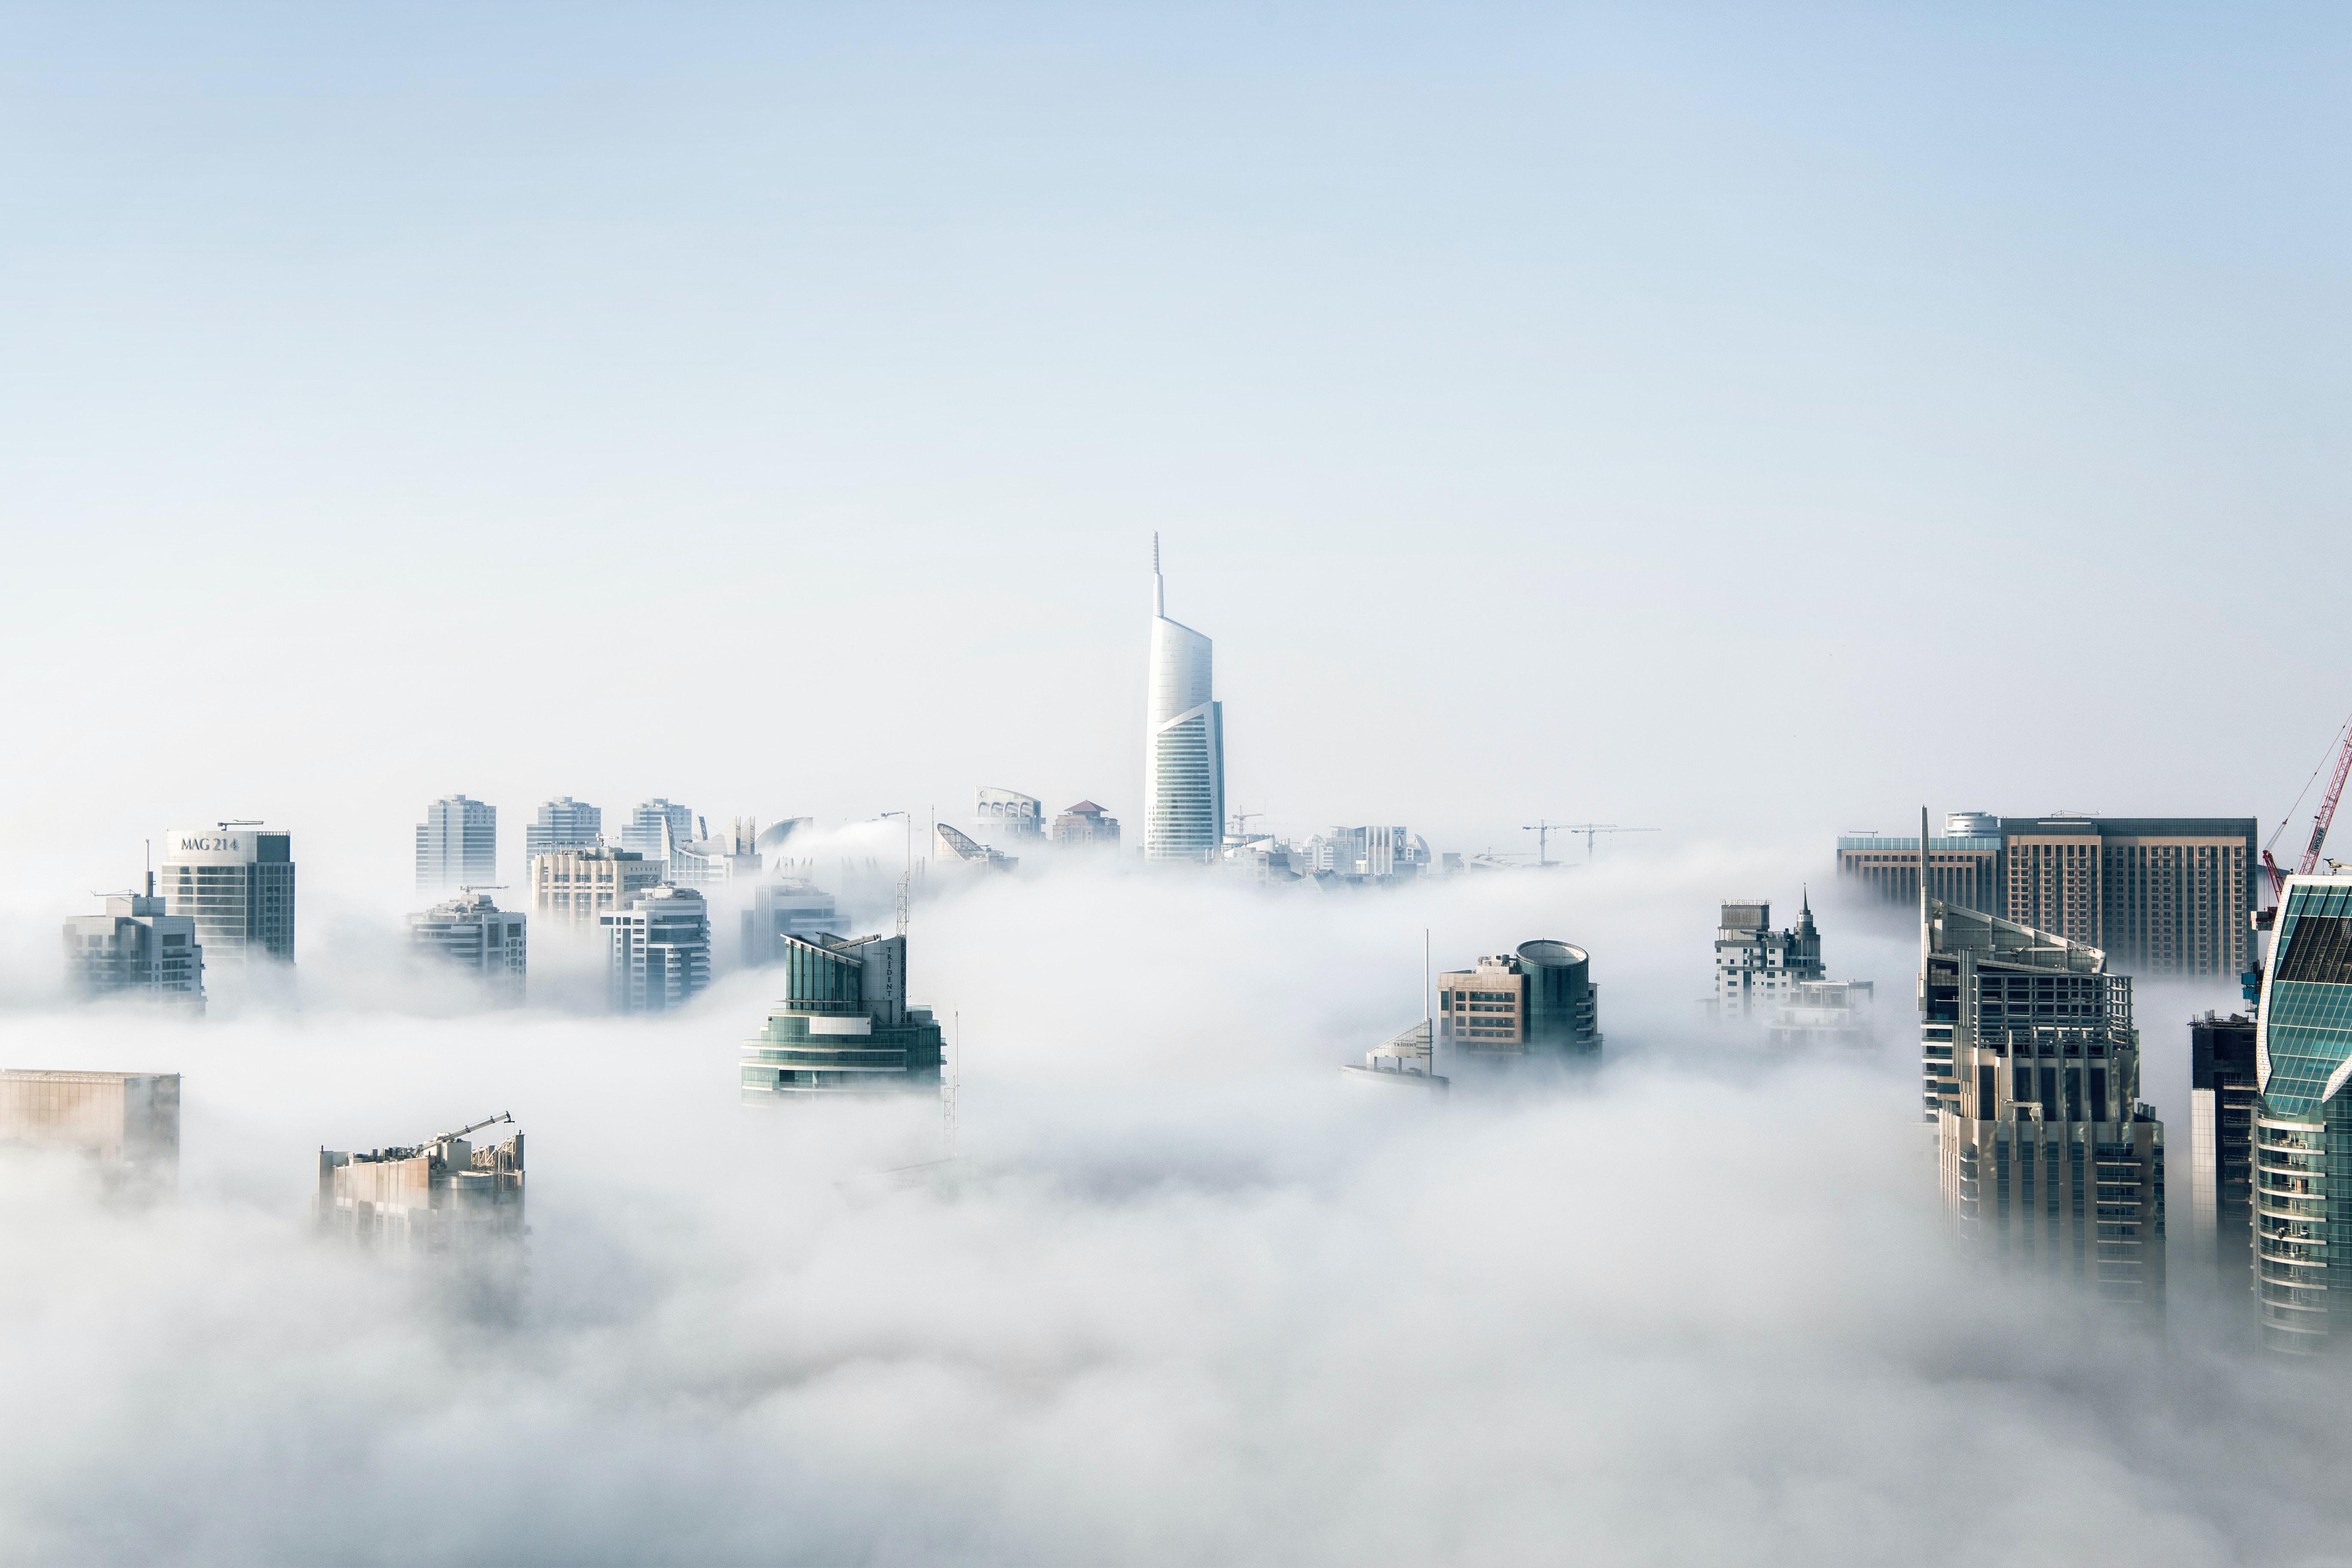 architecture-buildings-business-city-325185